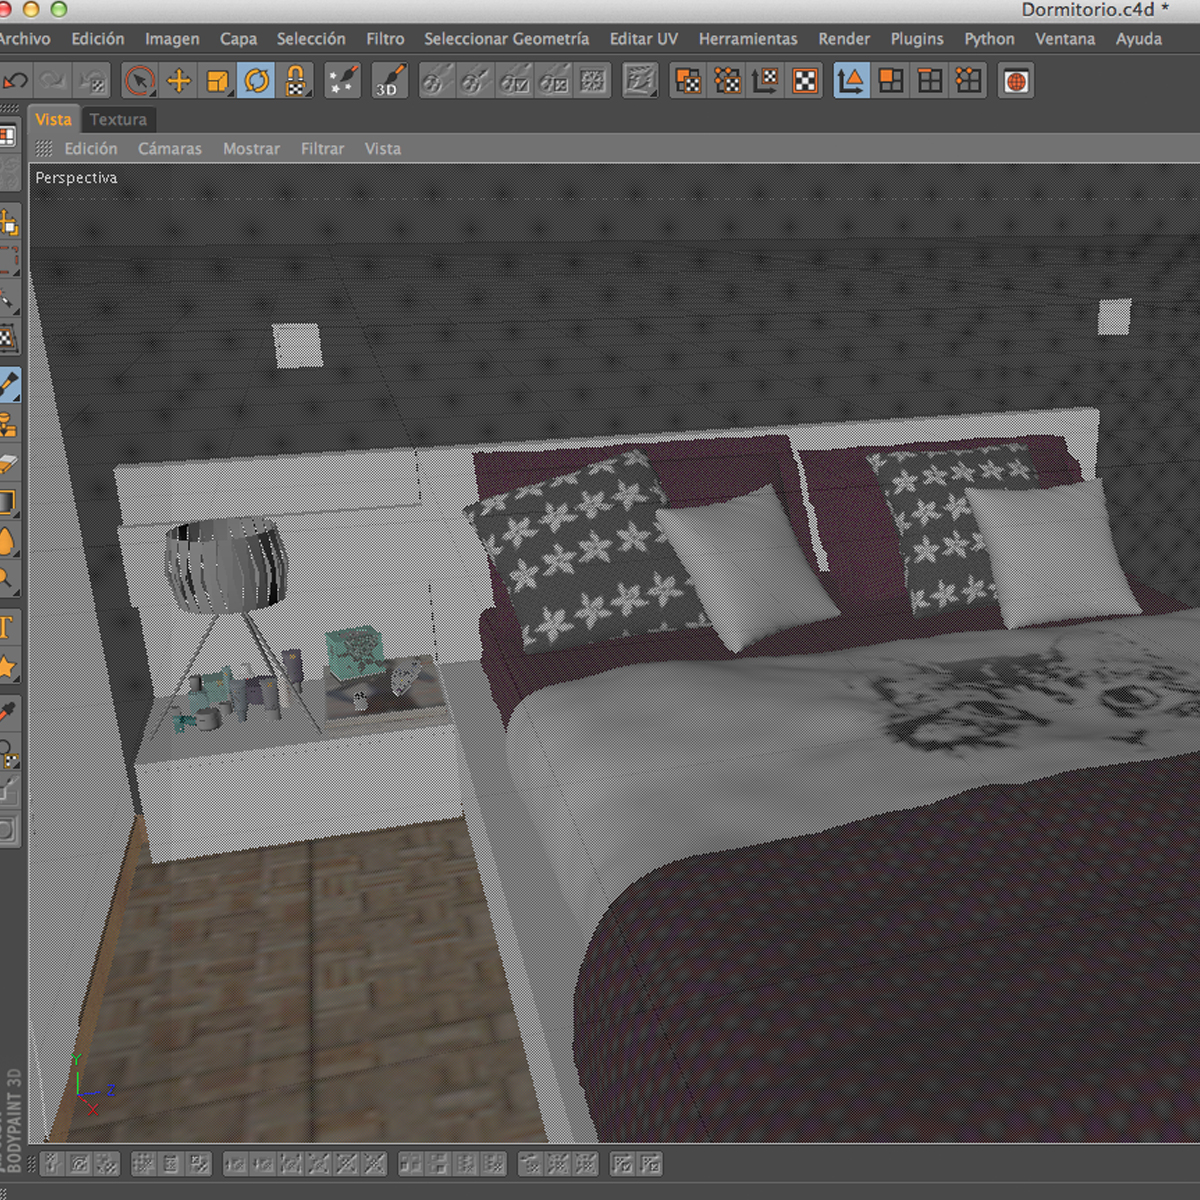 guļamistaba 8 3d modelis 3ds max fbx c4d ma mb obj 159568